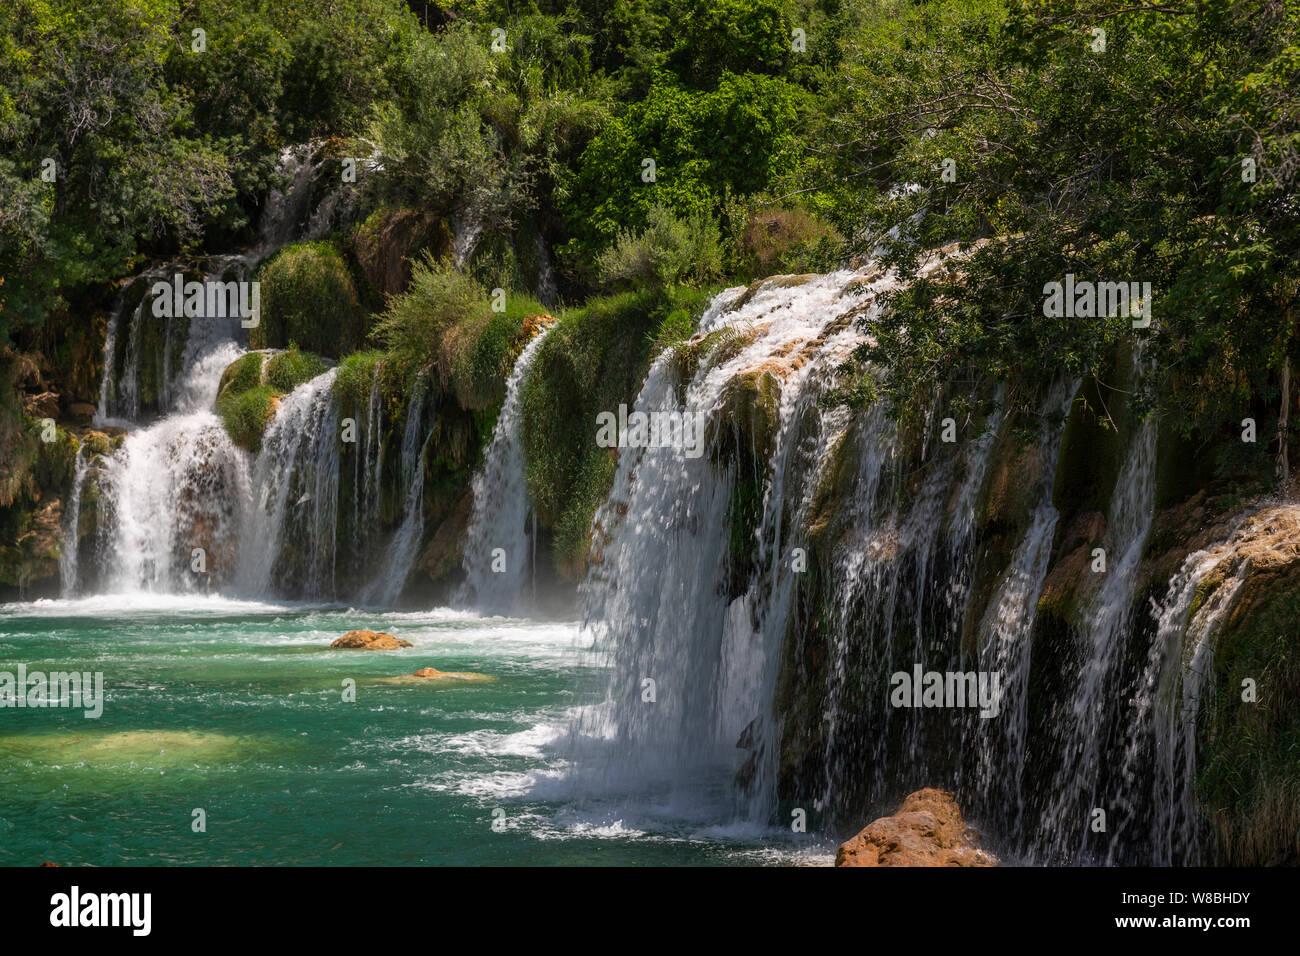 Skradinski Buk waterfalls in the Krka National Park, Croatia Stock Photo